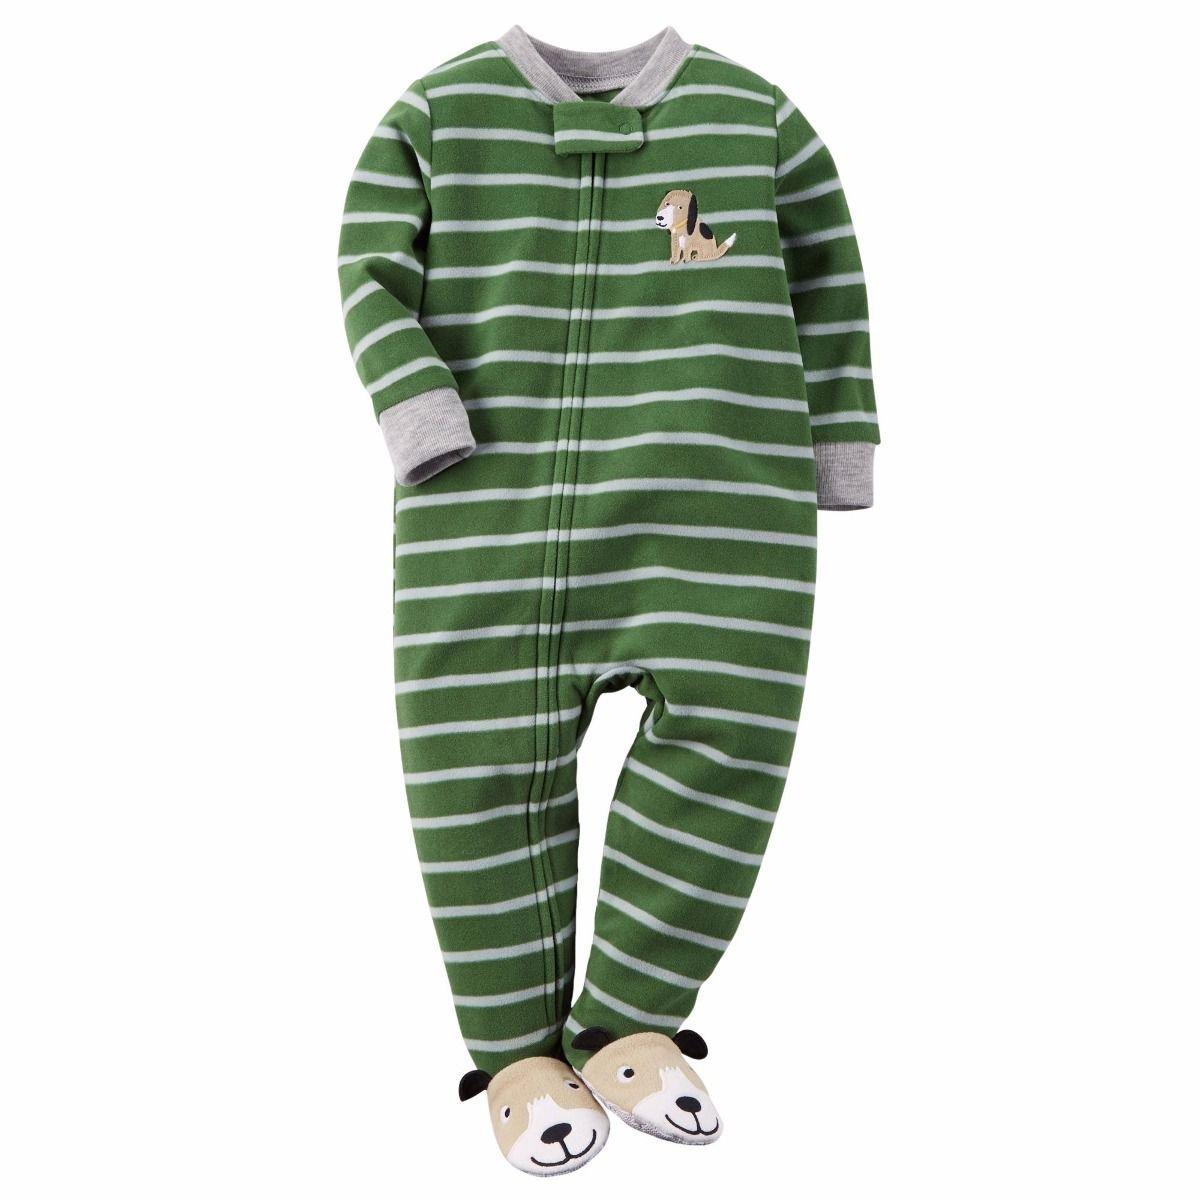 CARTERS Boys Size 3T Striped Puppy Dog Fleece Footed Pajama Sleeper